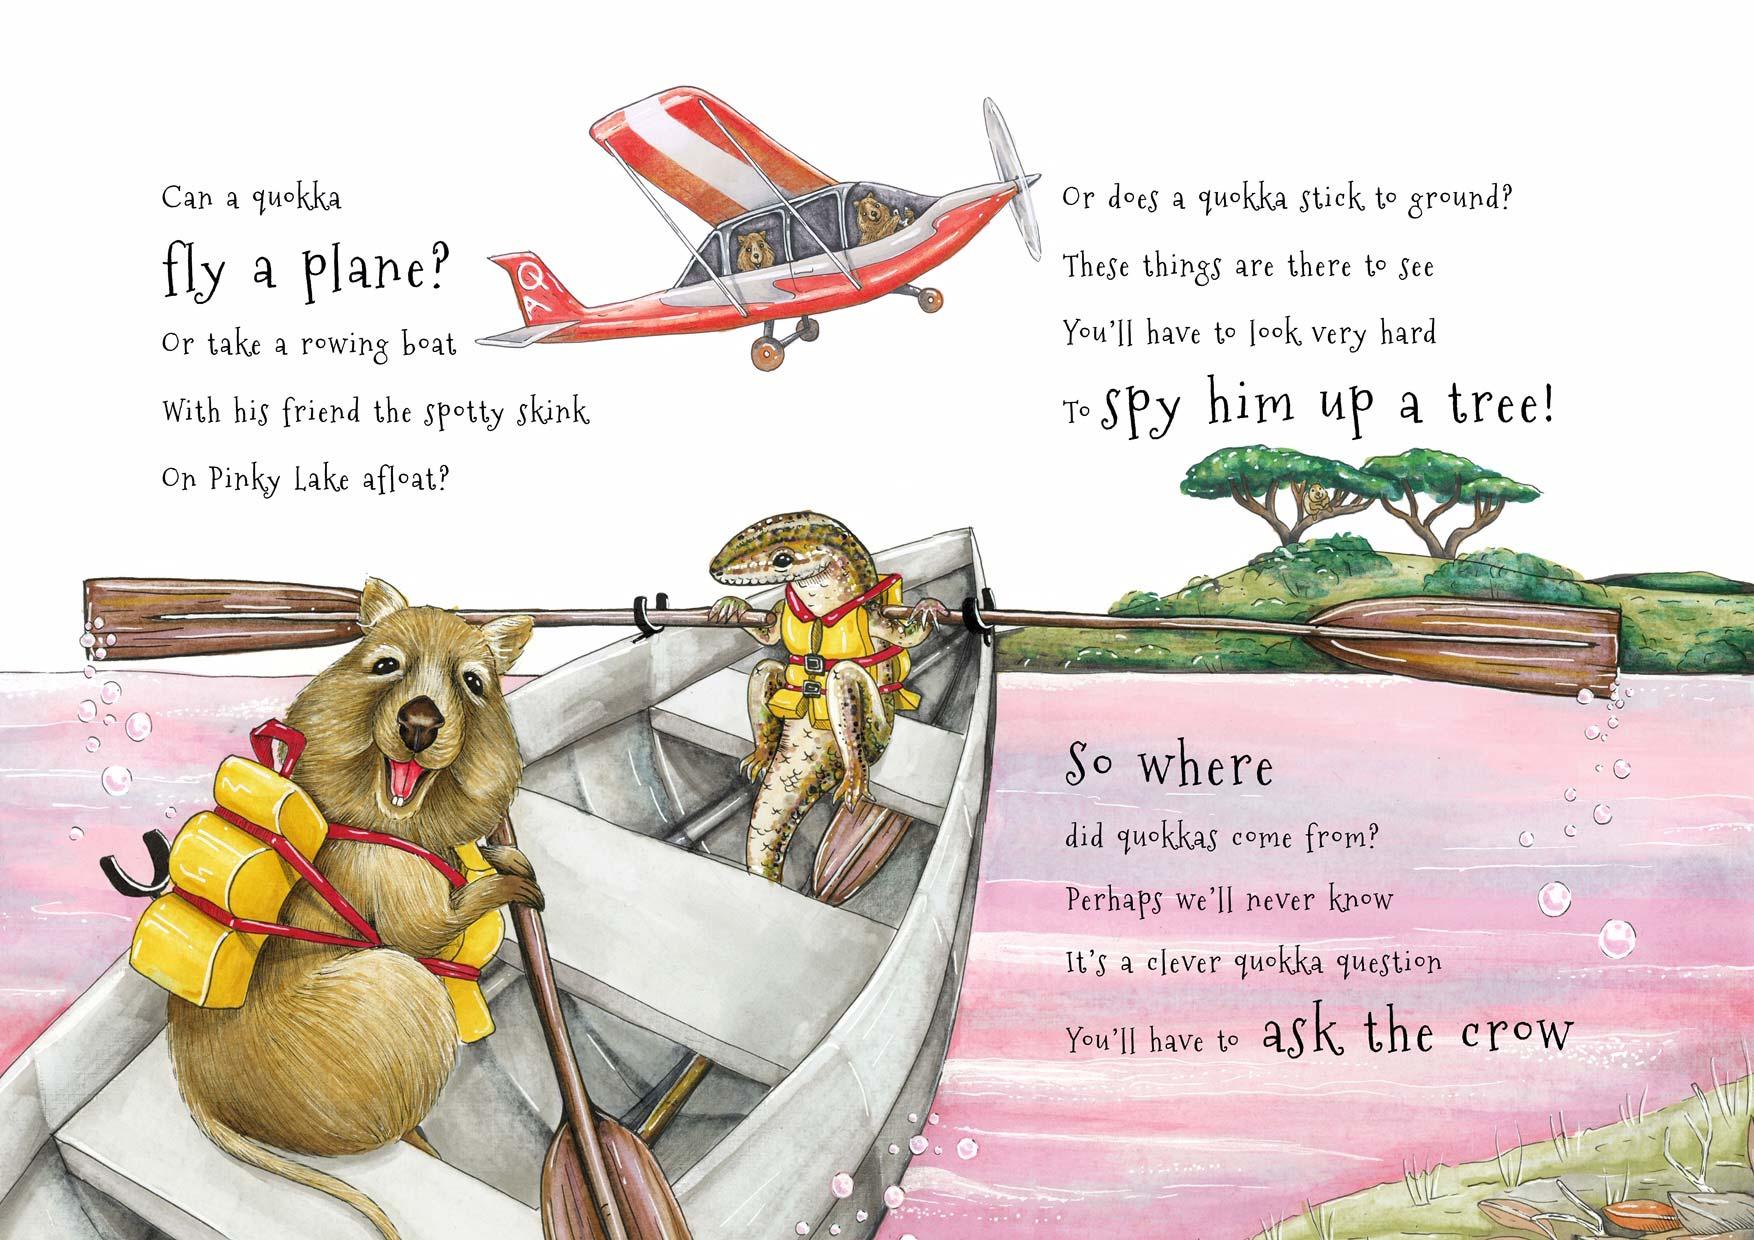 Jolly-Read-Can-a-Quokka-Quack-p8-web